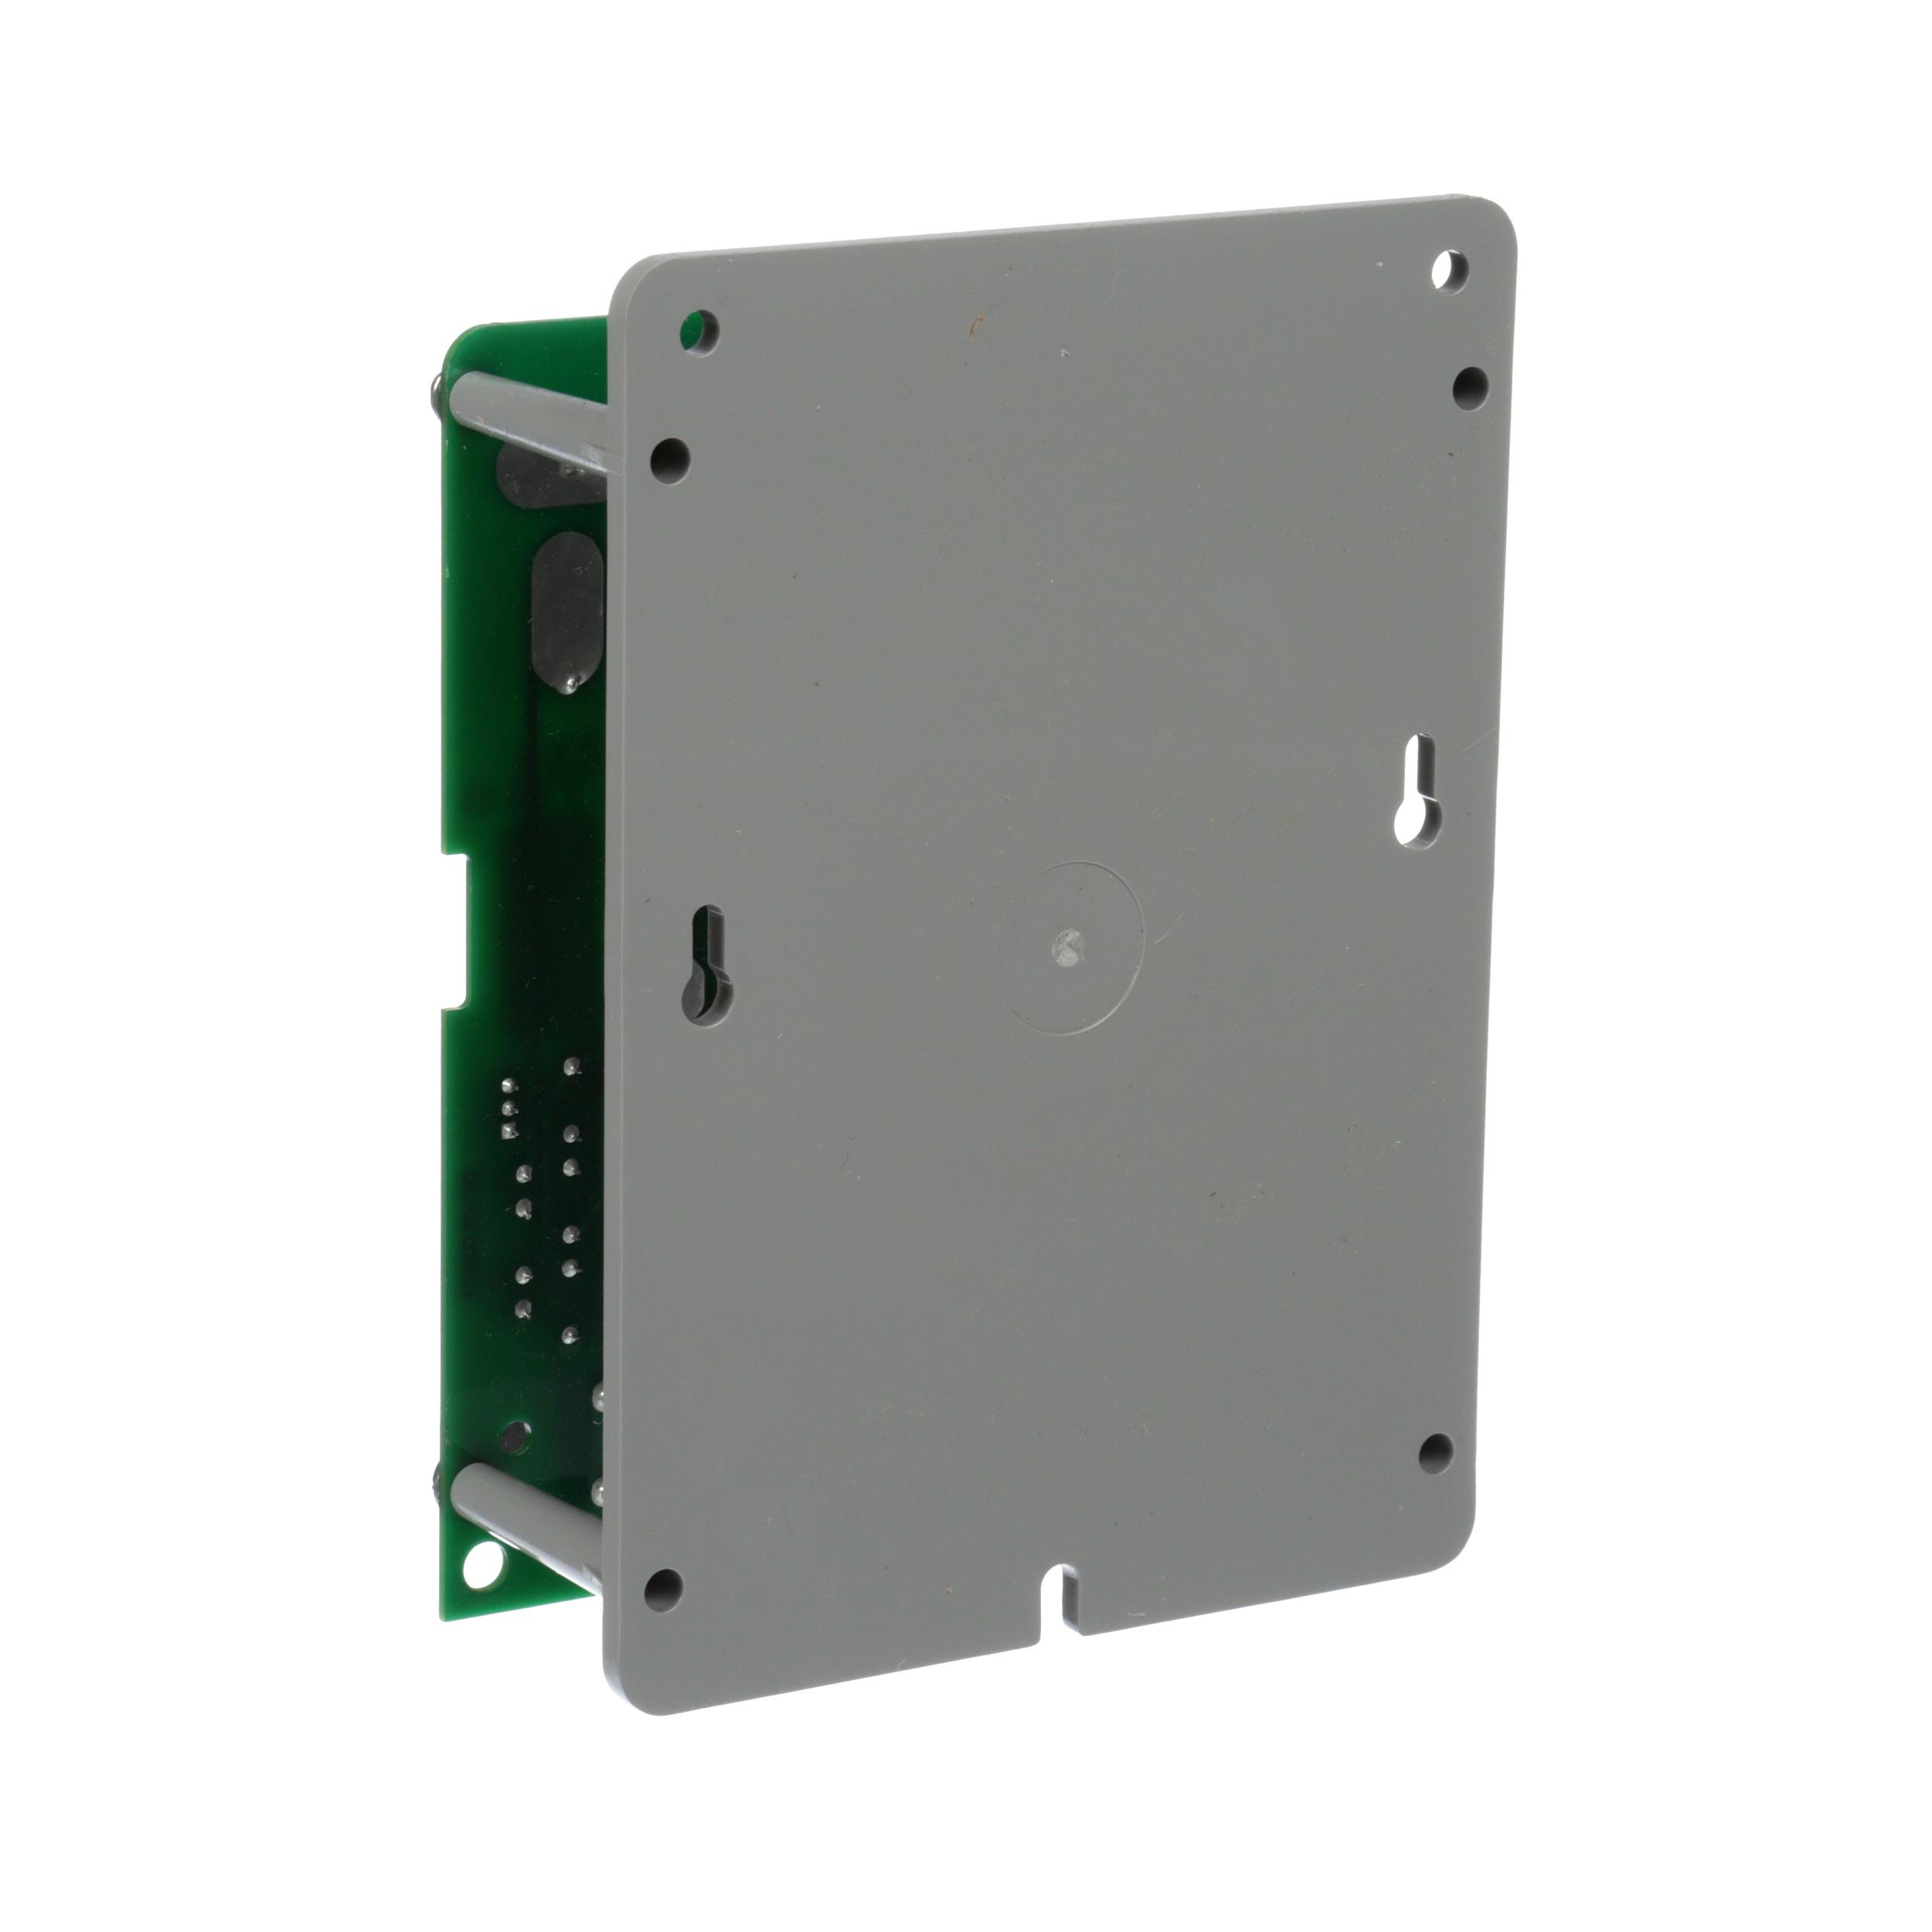 dual immersion switch wiring diagram john deere stx38 warren heater block